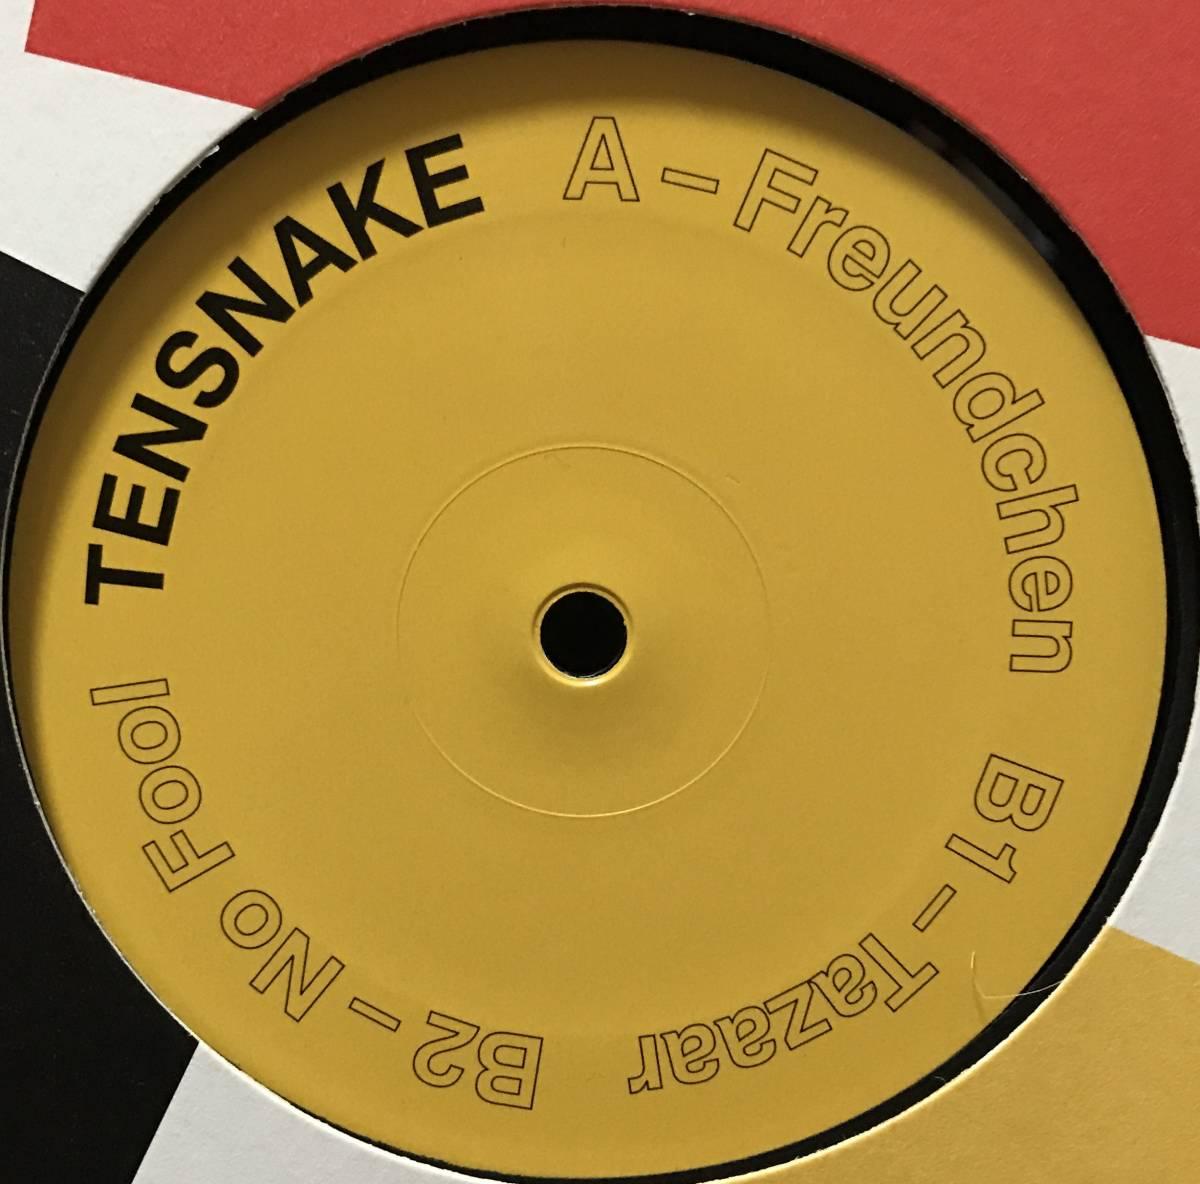 [12] Tensnake - Freundchen (Tech House) ☆True Romance キラー! スペーストリップ! ディスコハウス! レコード Vinyl_画像2